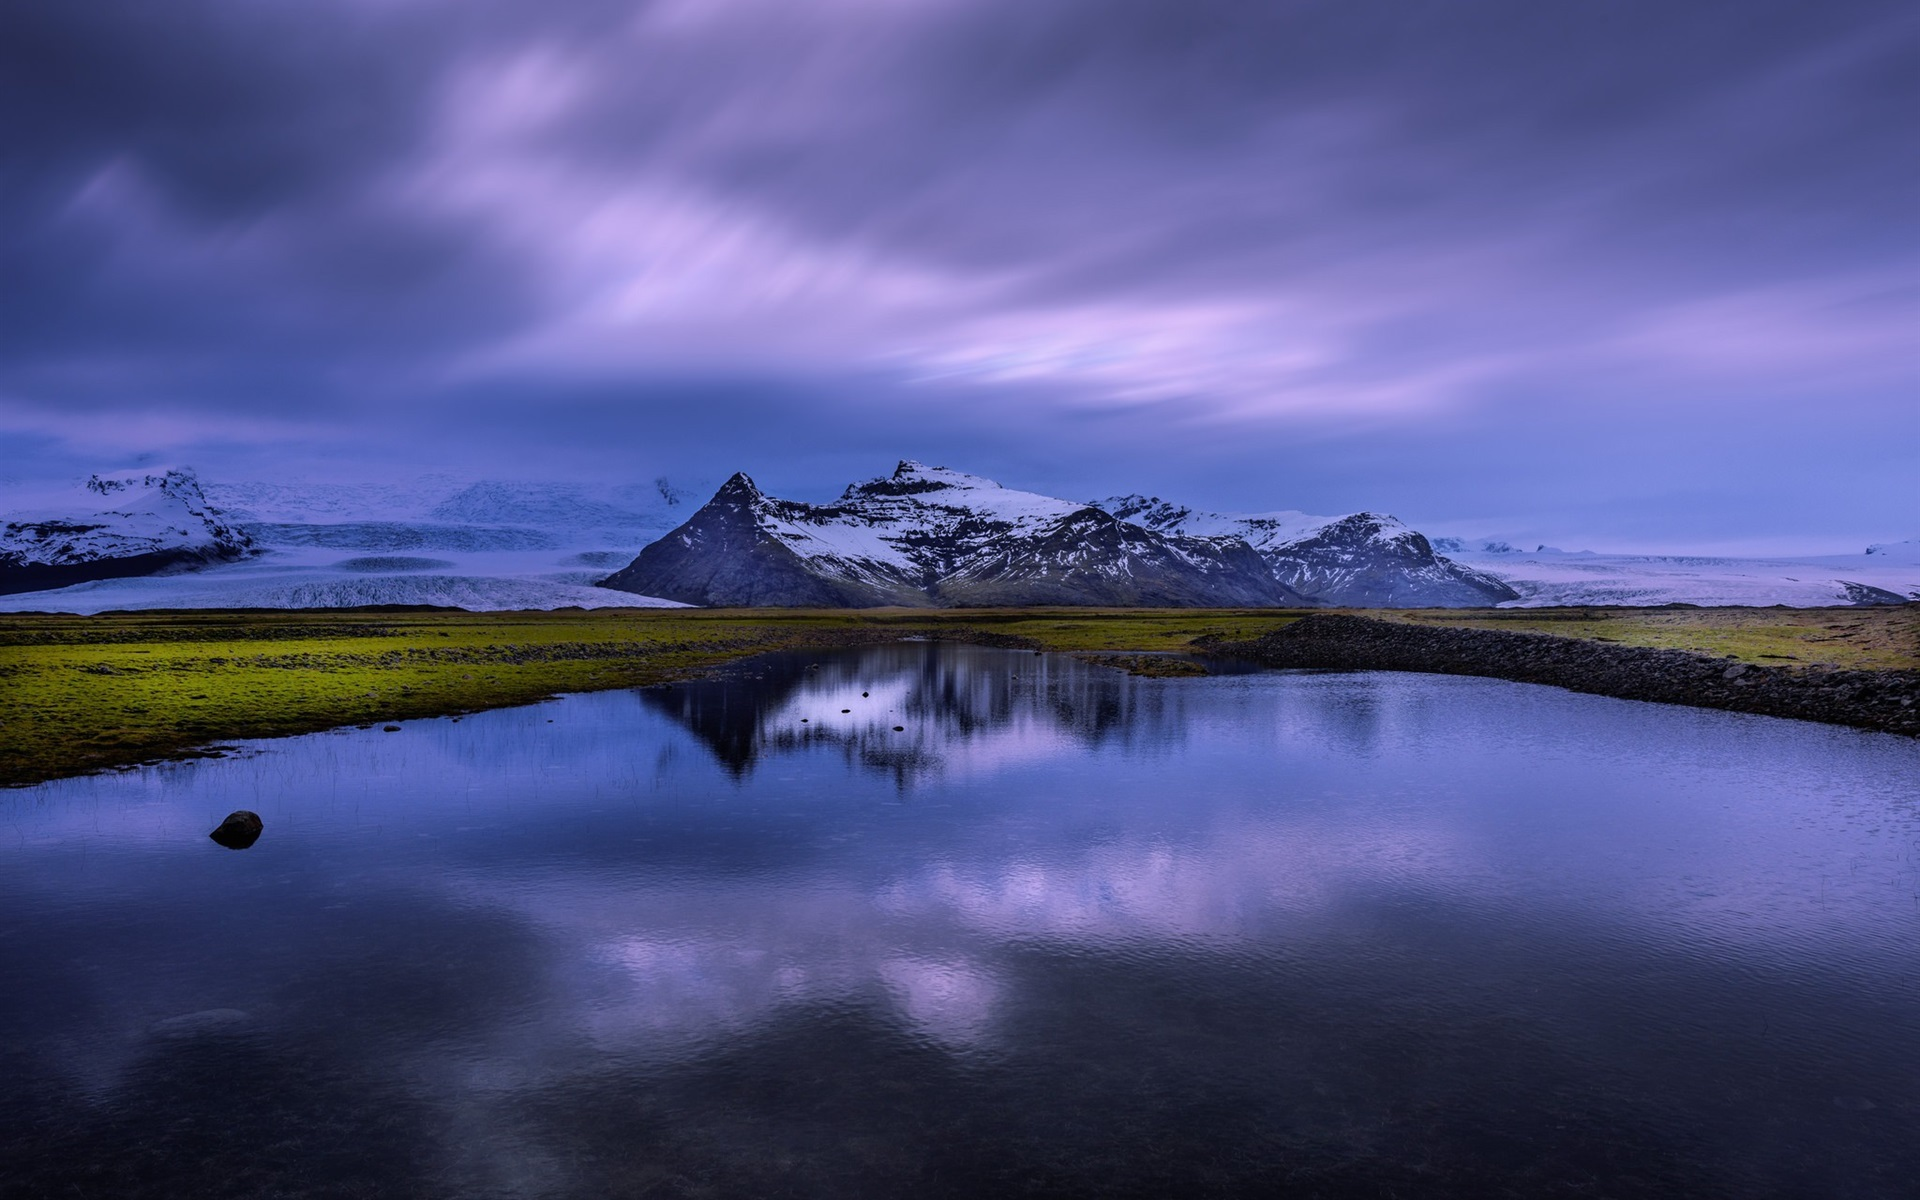 Lago Con Montañas Nevadas Hd: Fondos De Pantalla Islandia, Lago, Reflejo Del Agua